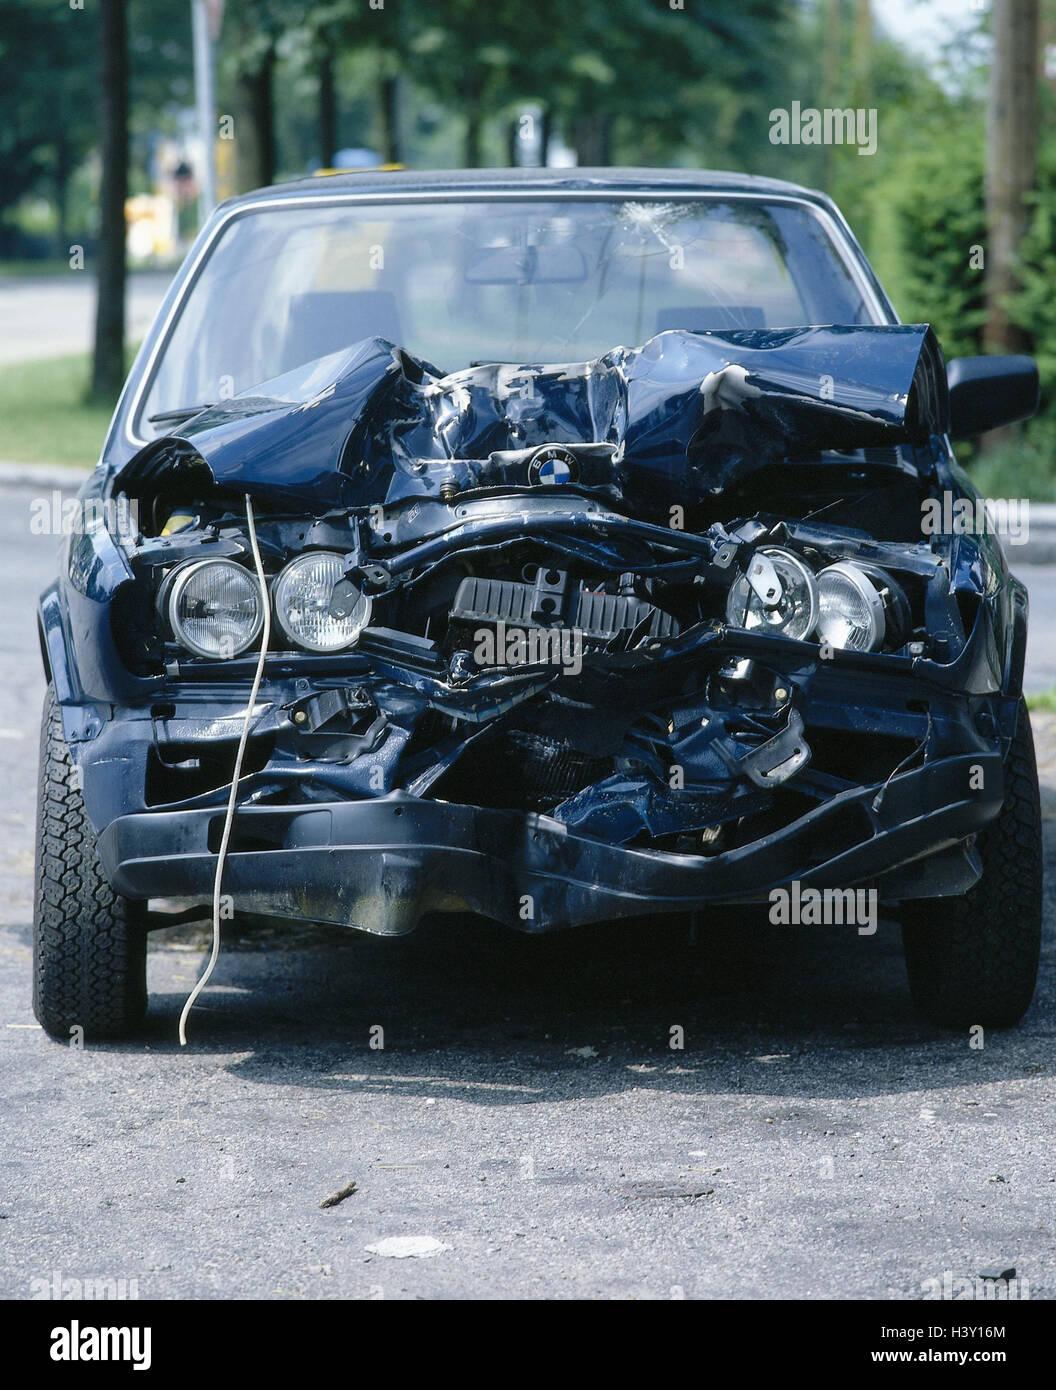 Accident, Traffic, Ambulance, Total Loss Passenger Car